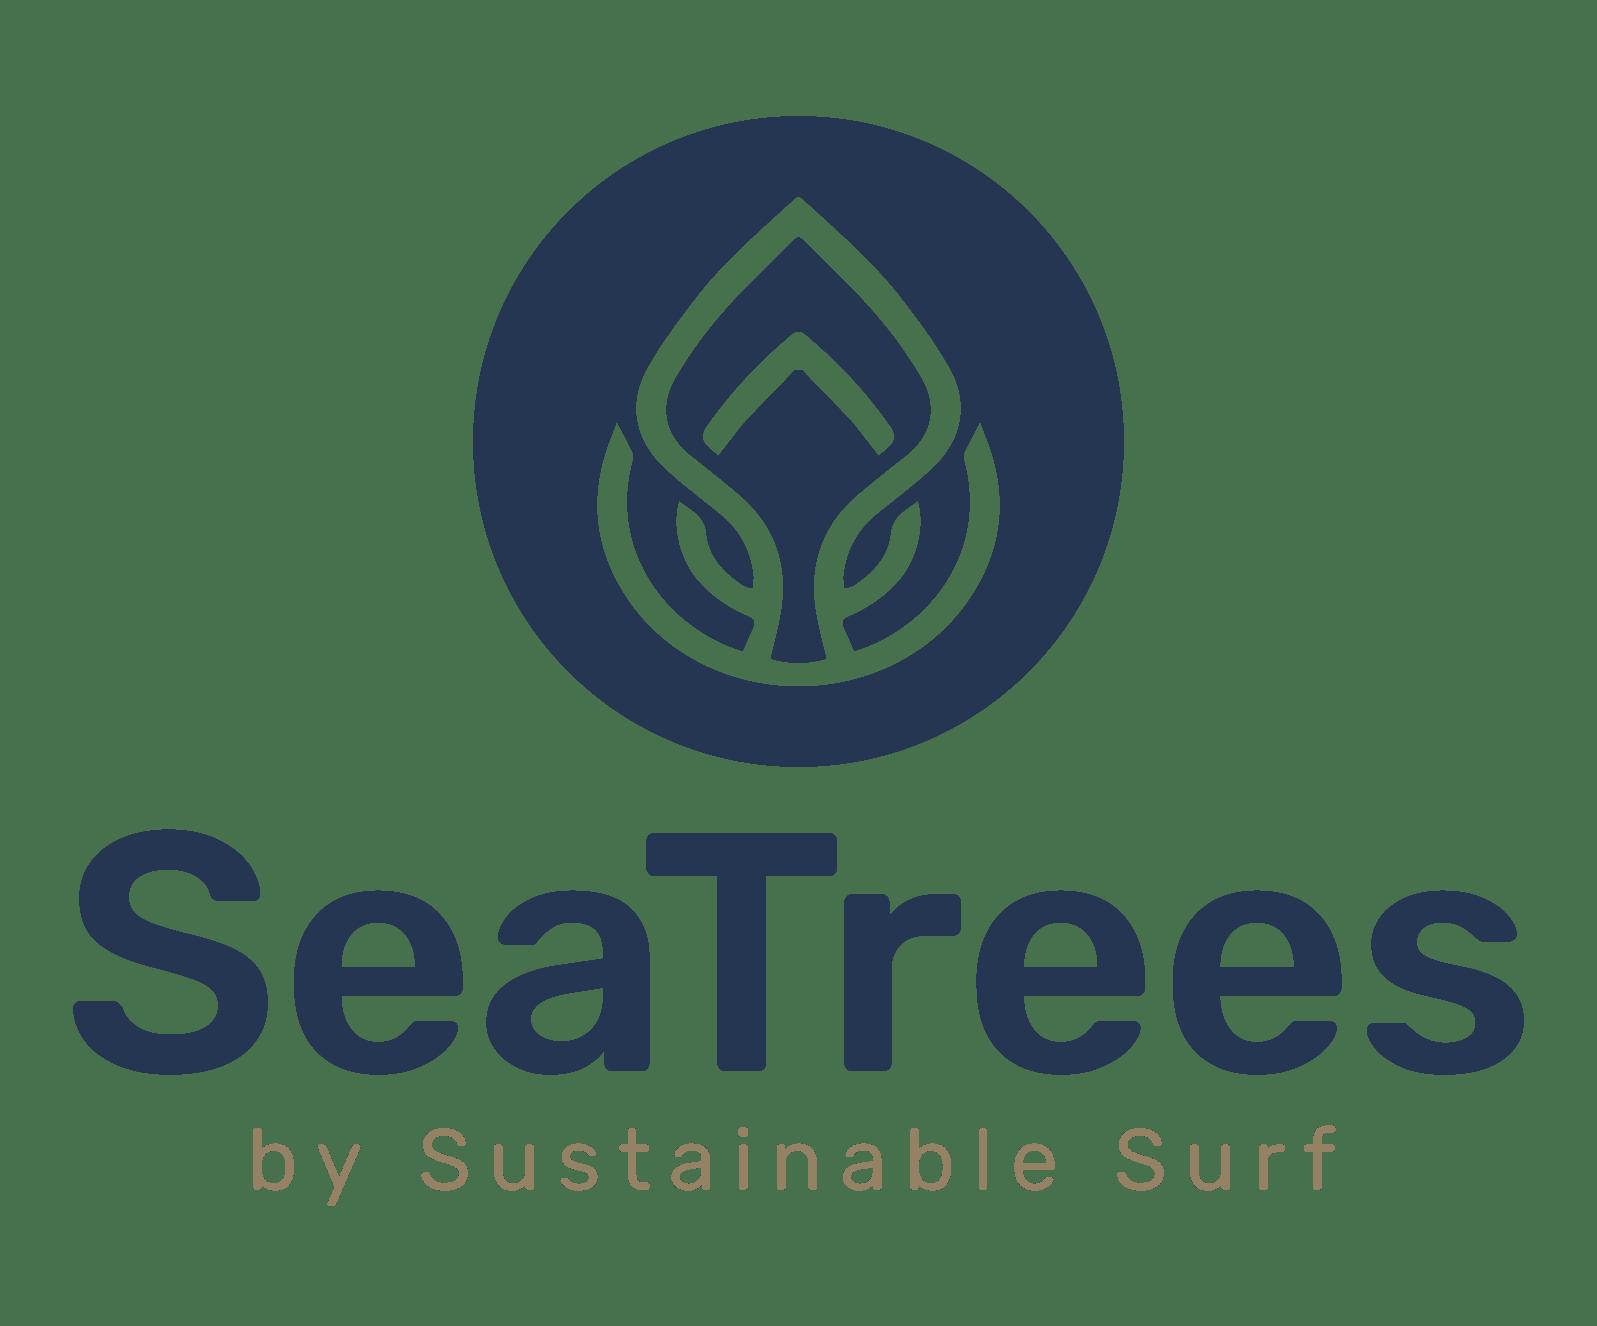 SeaTrees logo